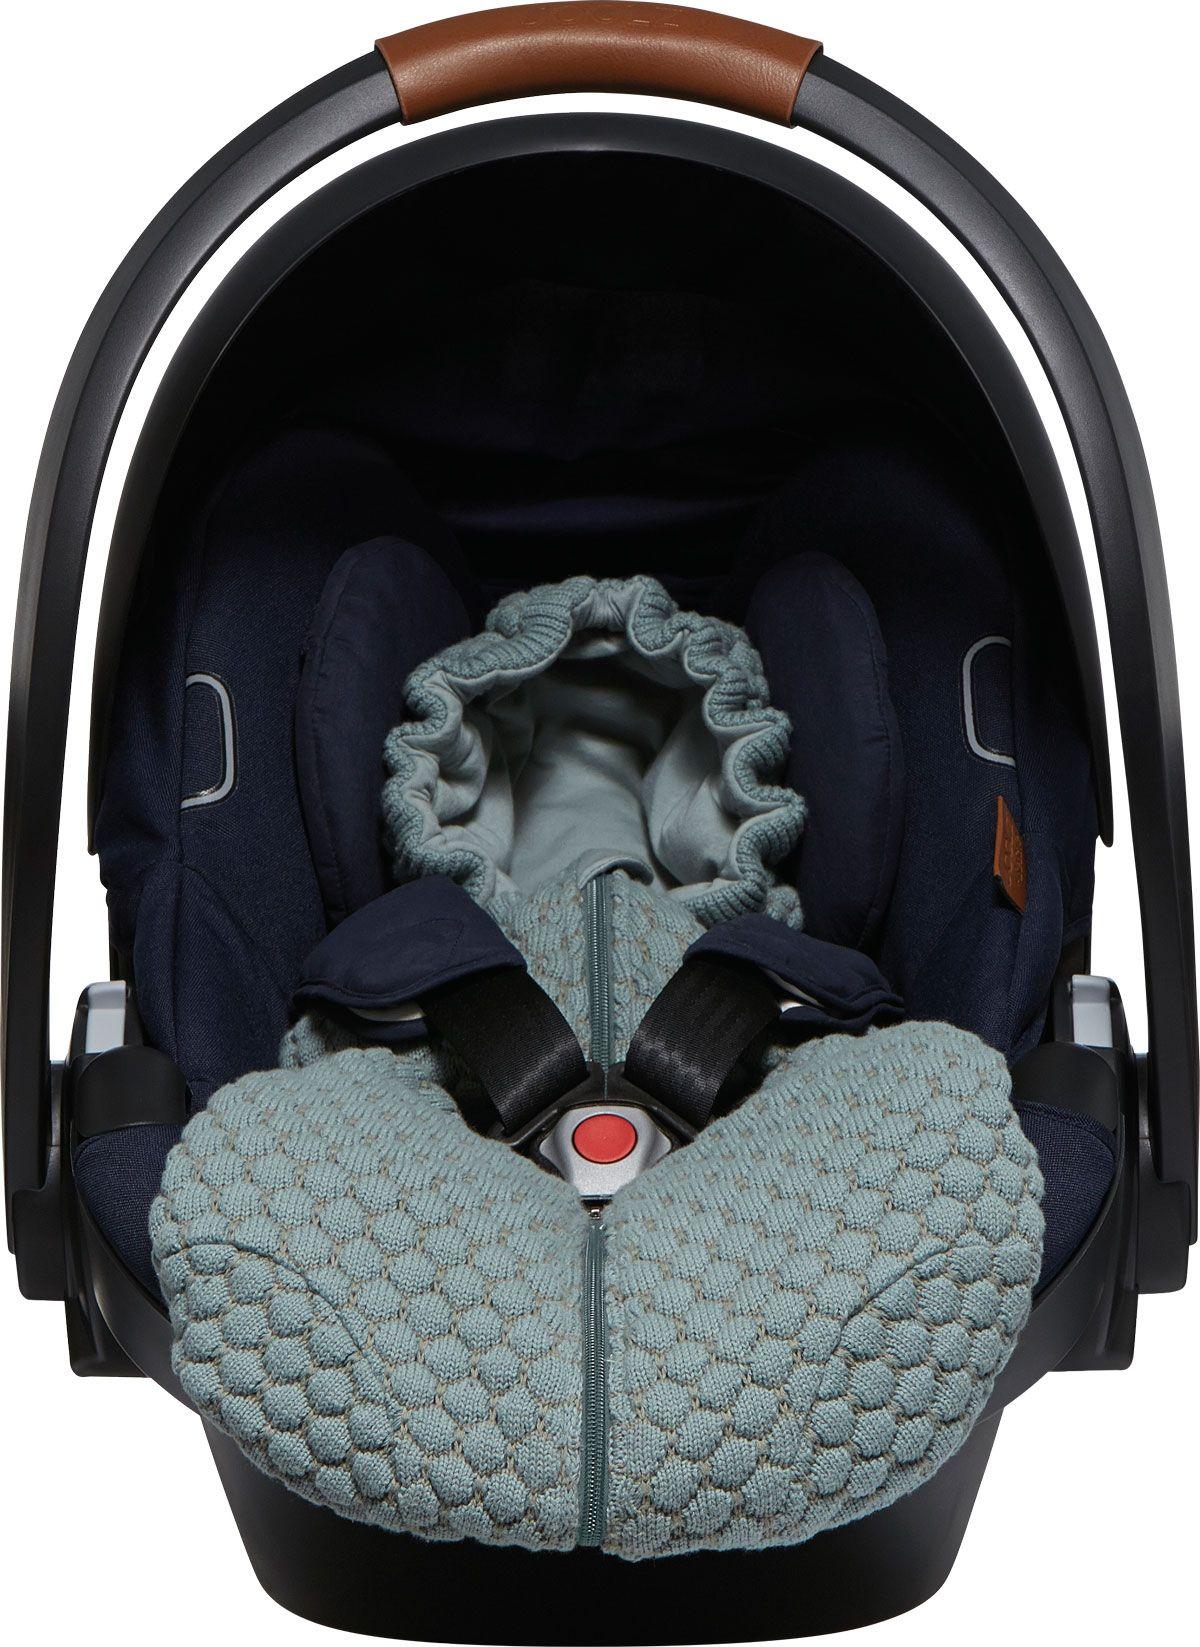 Joolz essentials nest car seat bunting